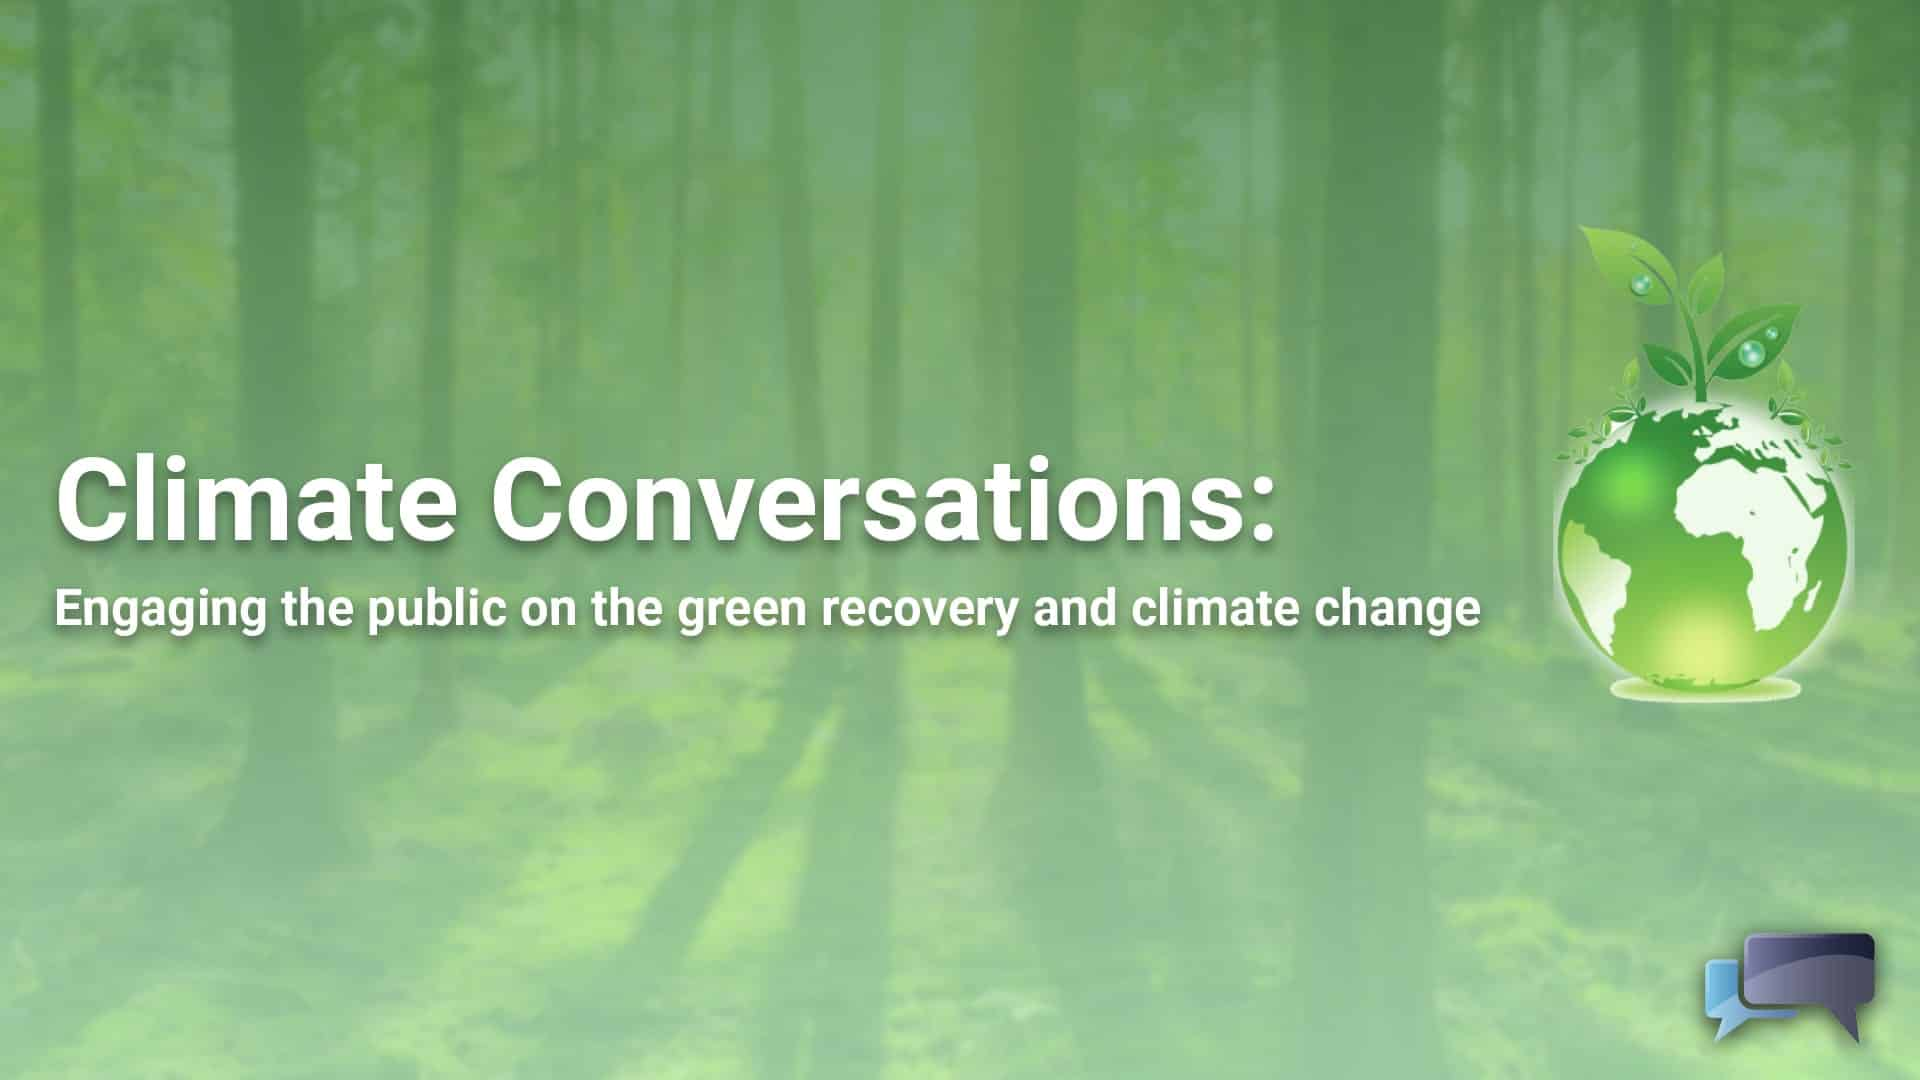 climateconversationsimage-min